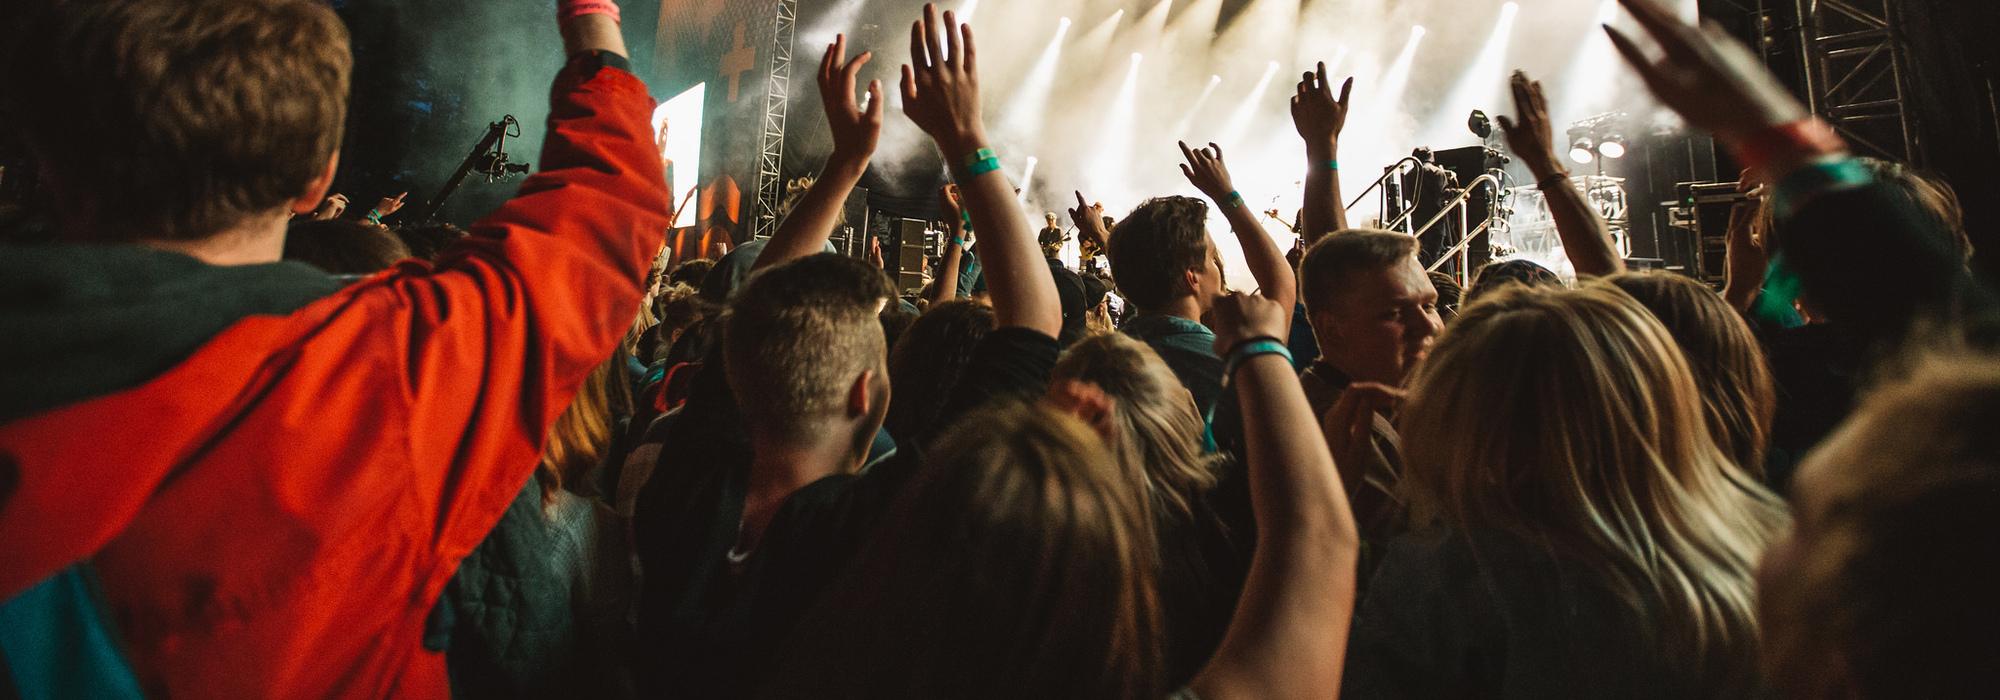 A Cruel World Festival live event